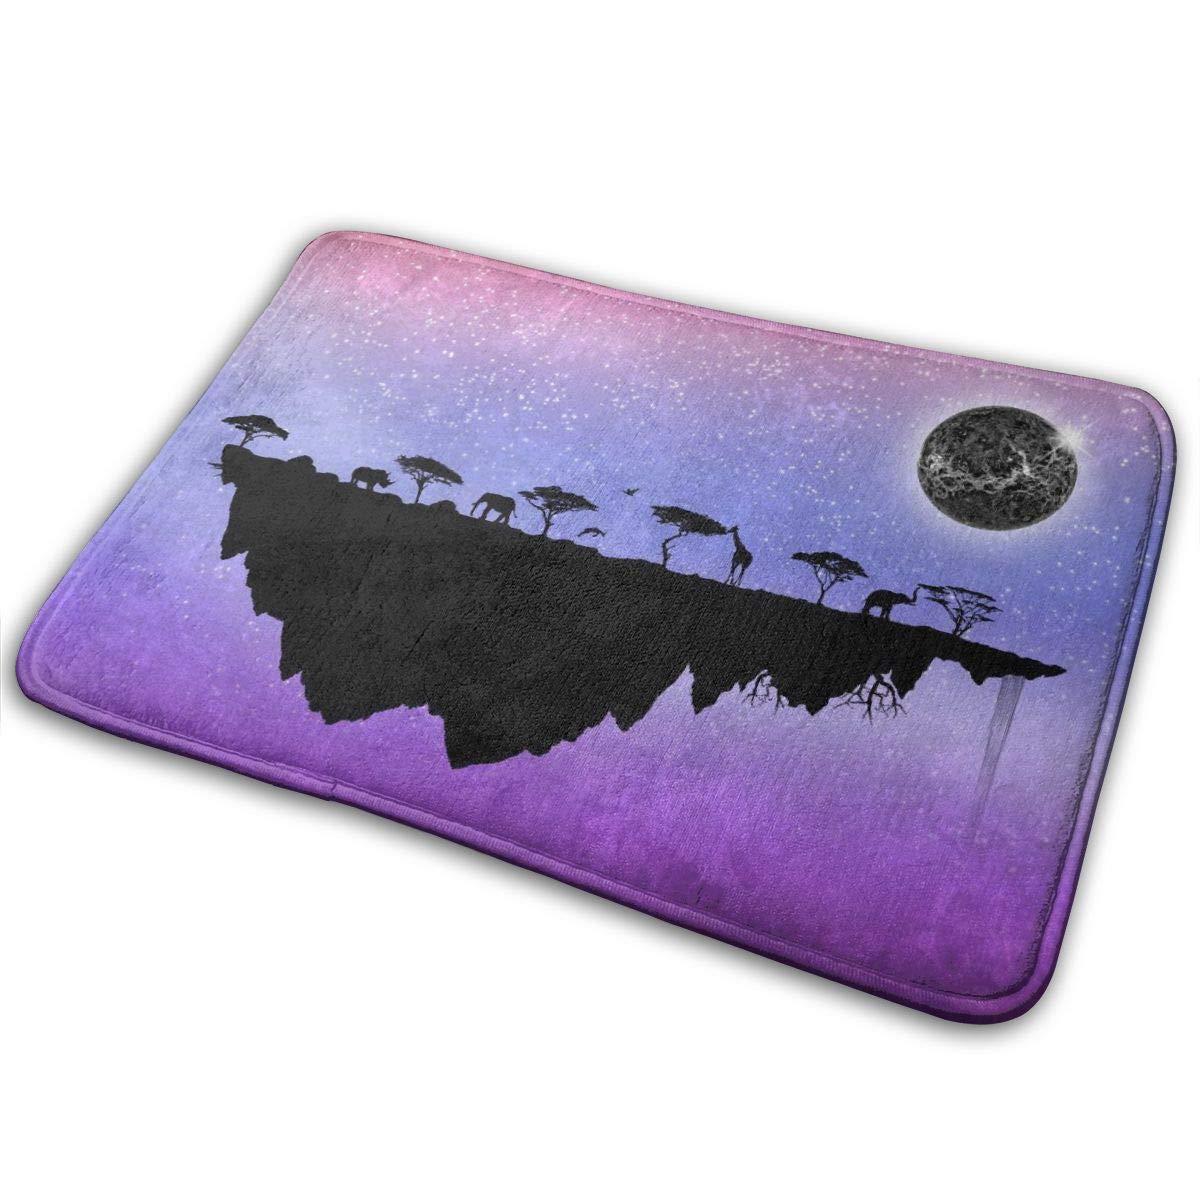 Amazon.com: NiYoung Pace Elephant Giraffe Moon Island Purple ...